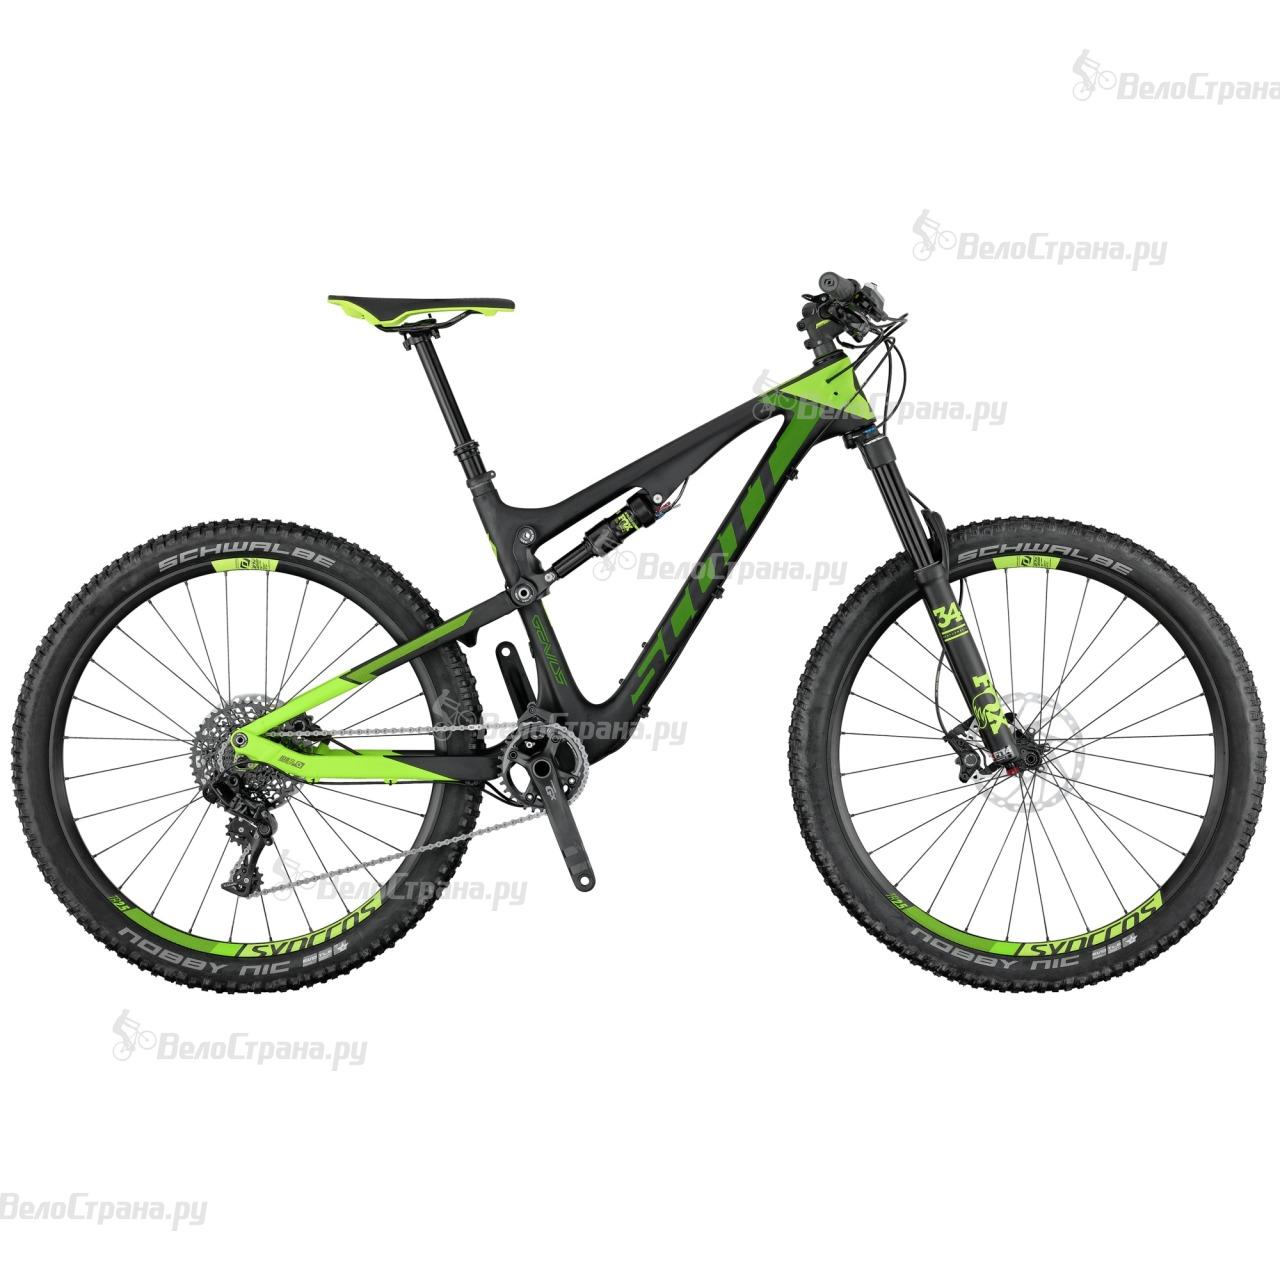 Велосипед Scott Genius 720 (2017)